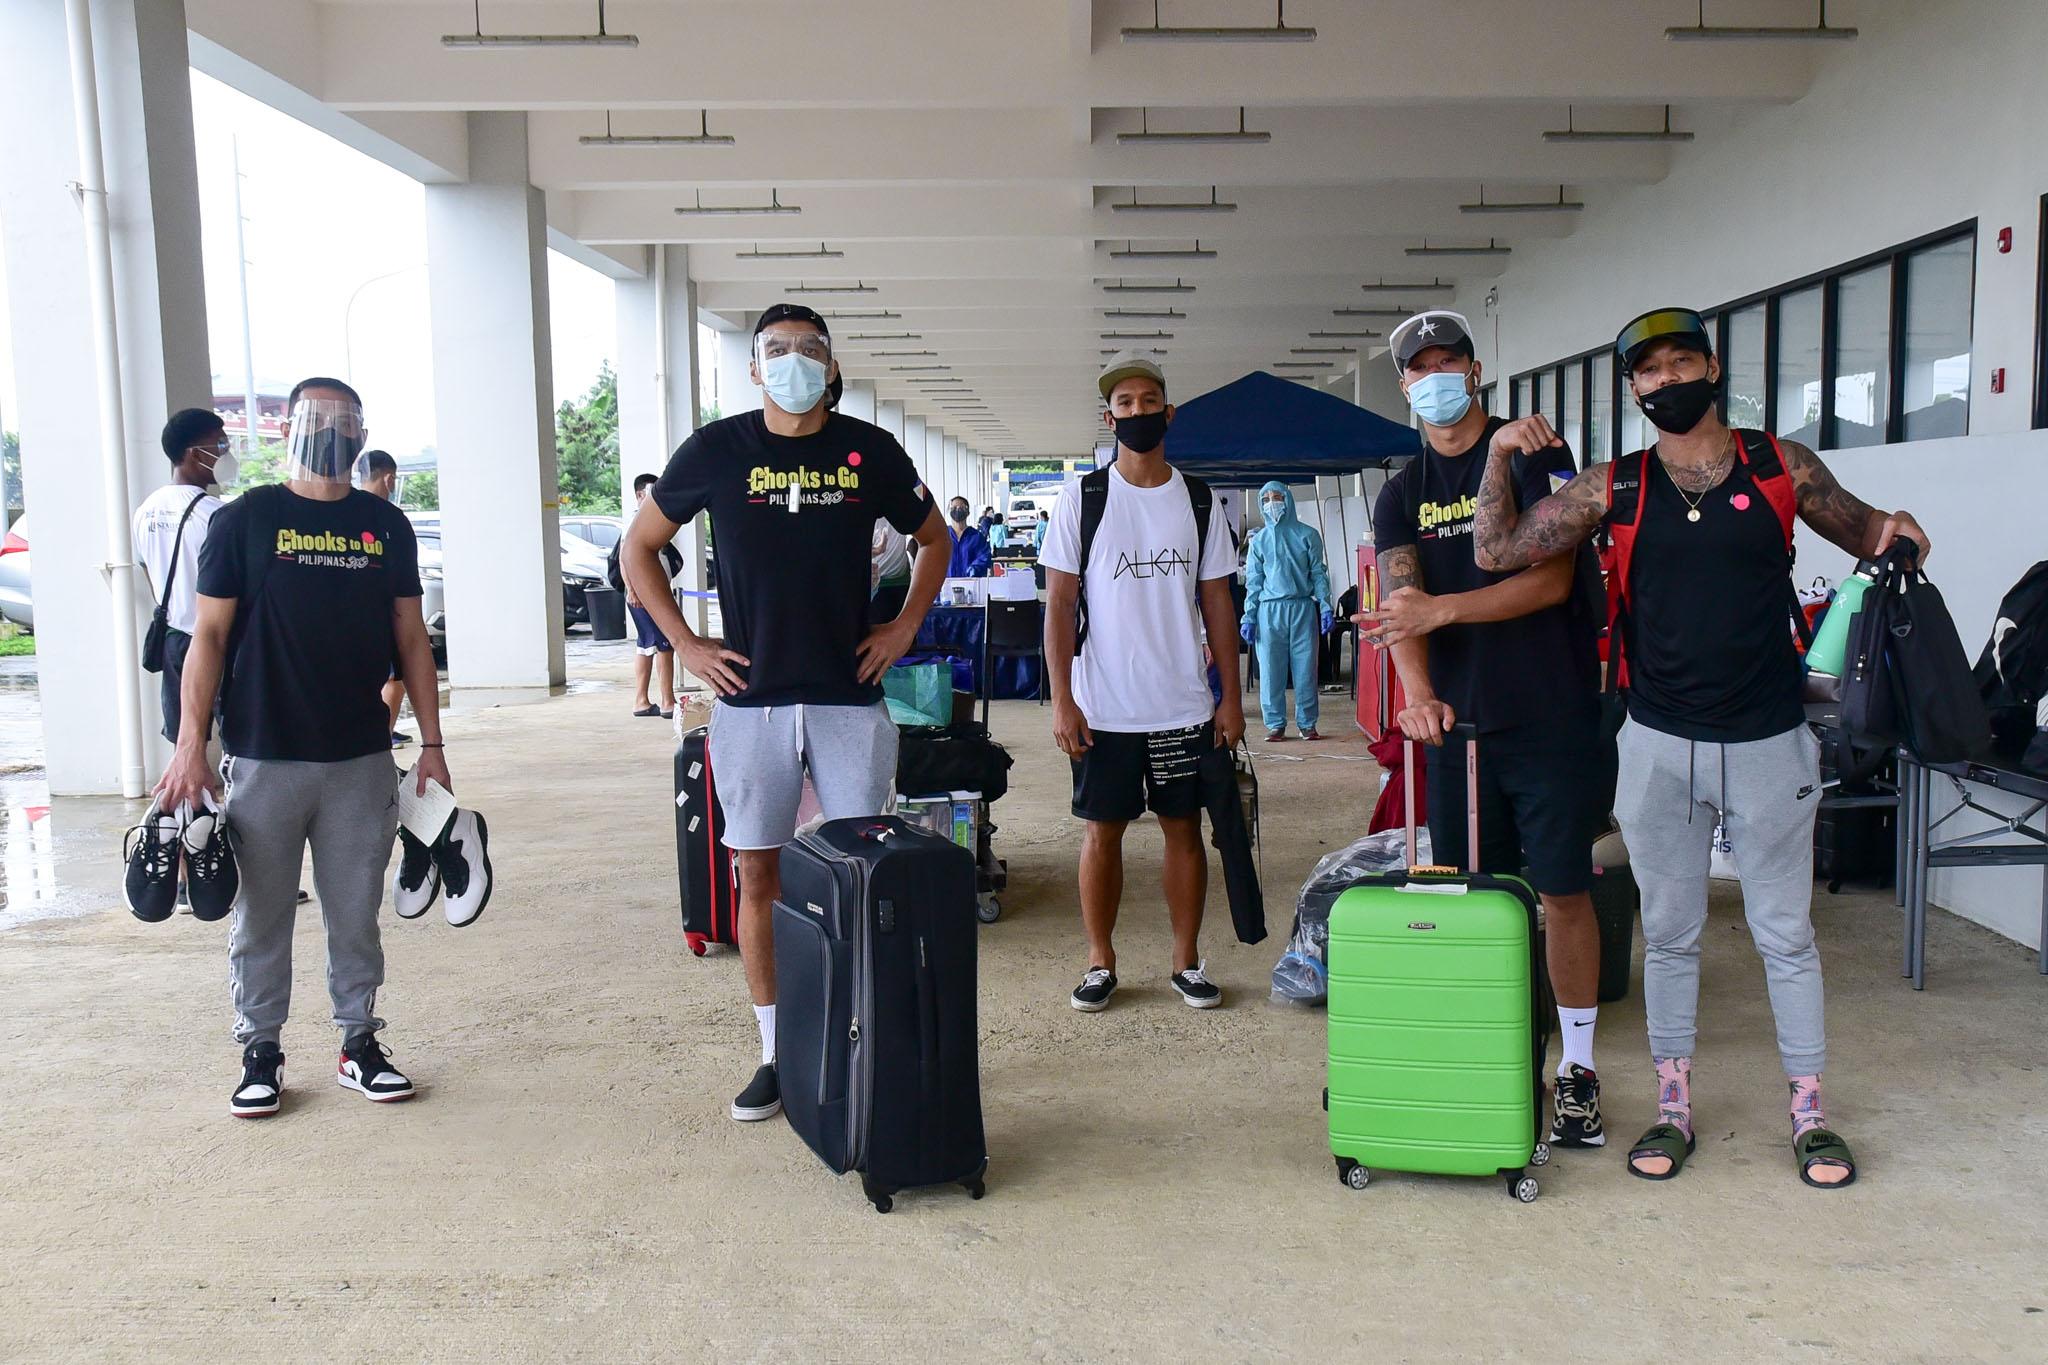 22-Oct-14-Calambubble-Ingress_5960 First seven teams enter Chooks 3x3's 'Calambubble' 3x3 Basketball Chooks-to-Go Pilipinas 3x3 News  - philippine sports news